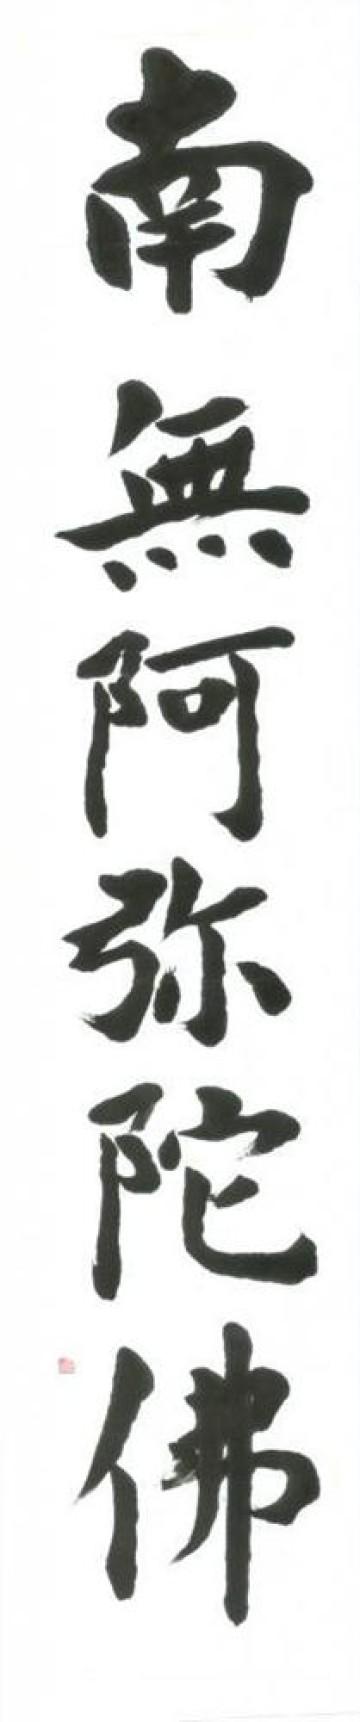 Hail to Amida (Amitabha) Buddha